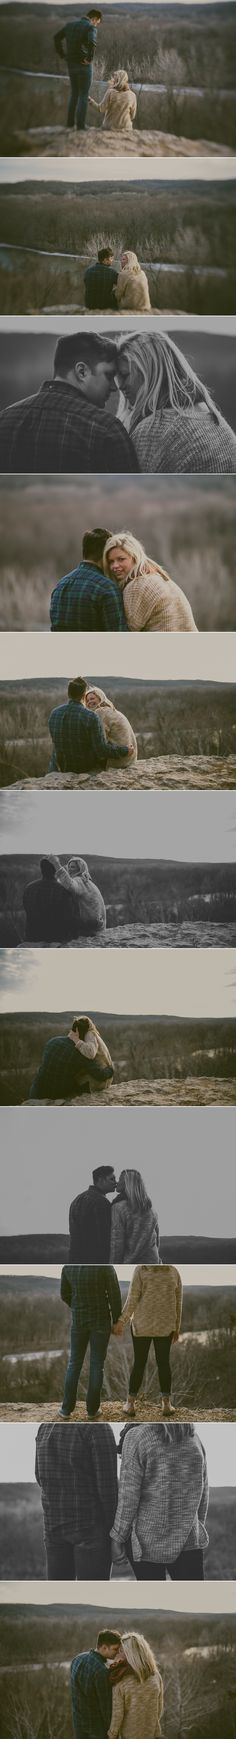 Scenic Engagement Photos - Bohemian Wedding Photographer - Saint Louis Photographer — Charis Rowland Photography - Castlewood State Park - Romantic photos - posing couples - trendy engagement photos #engagement #stlouis #romantic #modern #bohemian #boho #photography #pictures